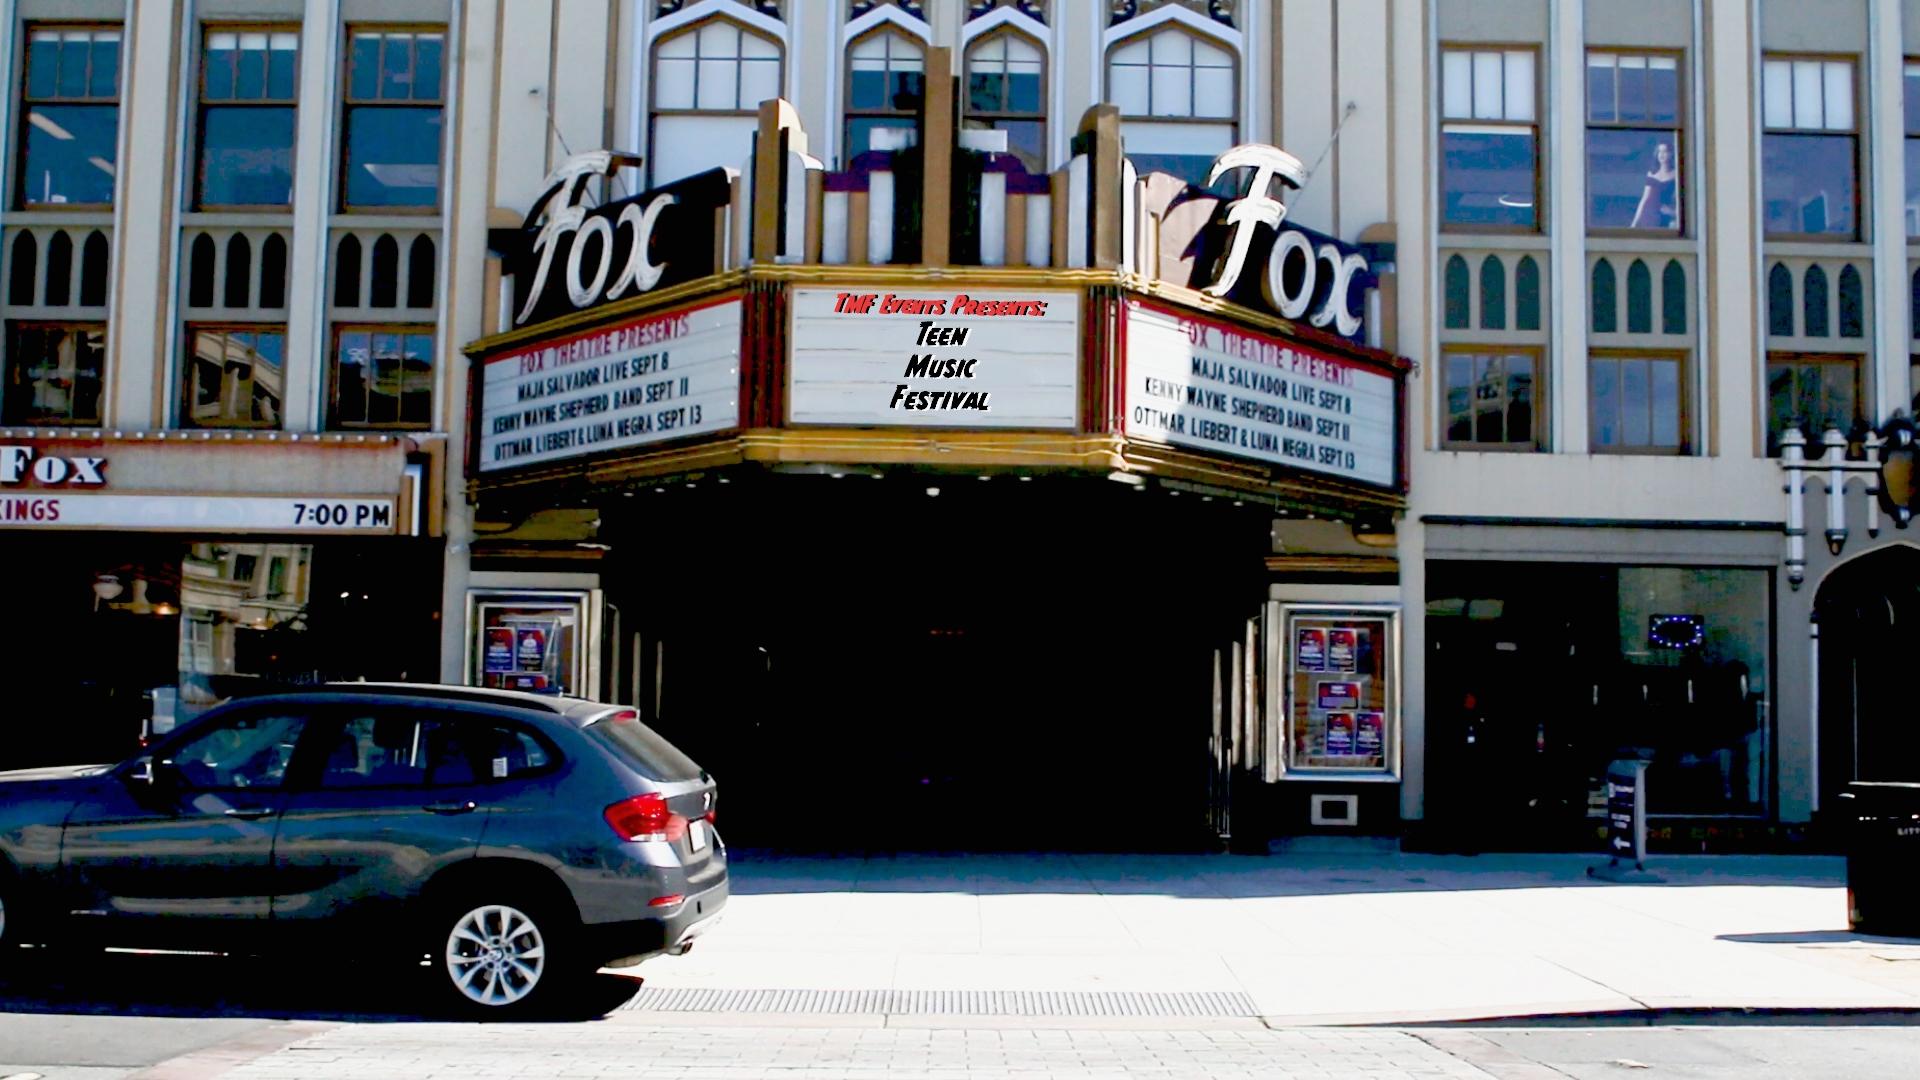 Teen Music Festival 1 - September 7th, 2018Fox TheatreRedwood City, CA